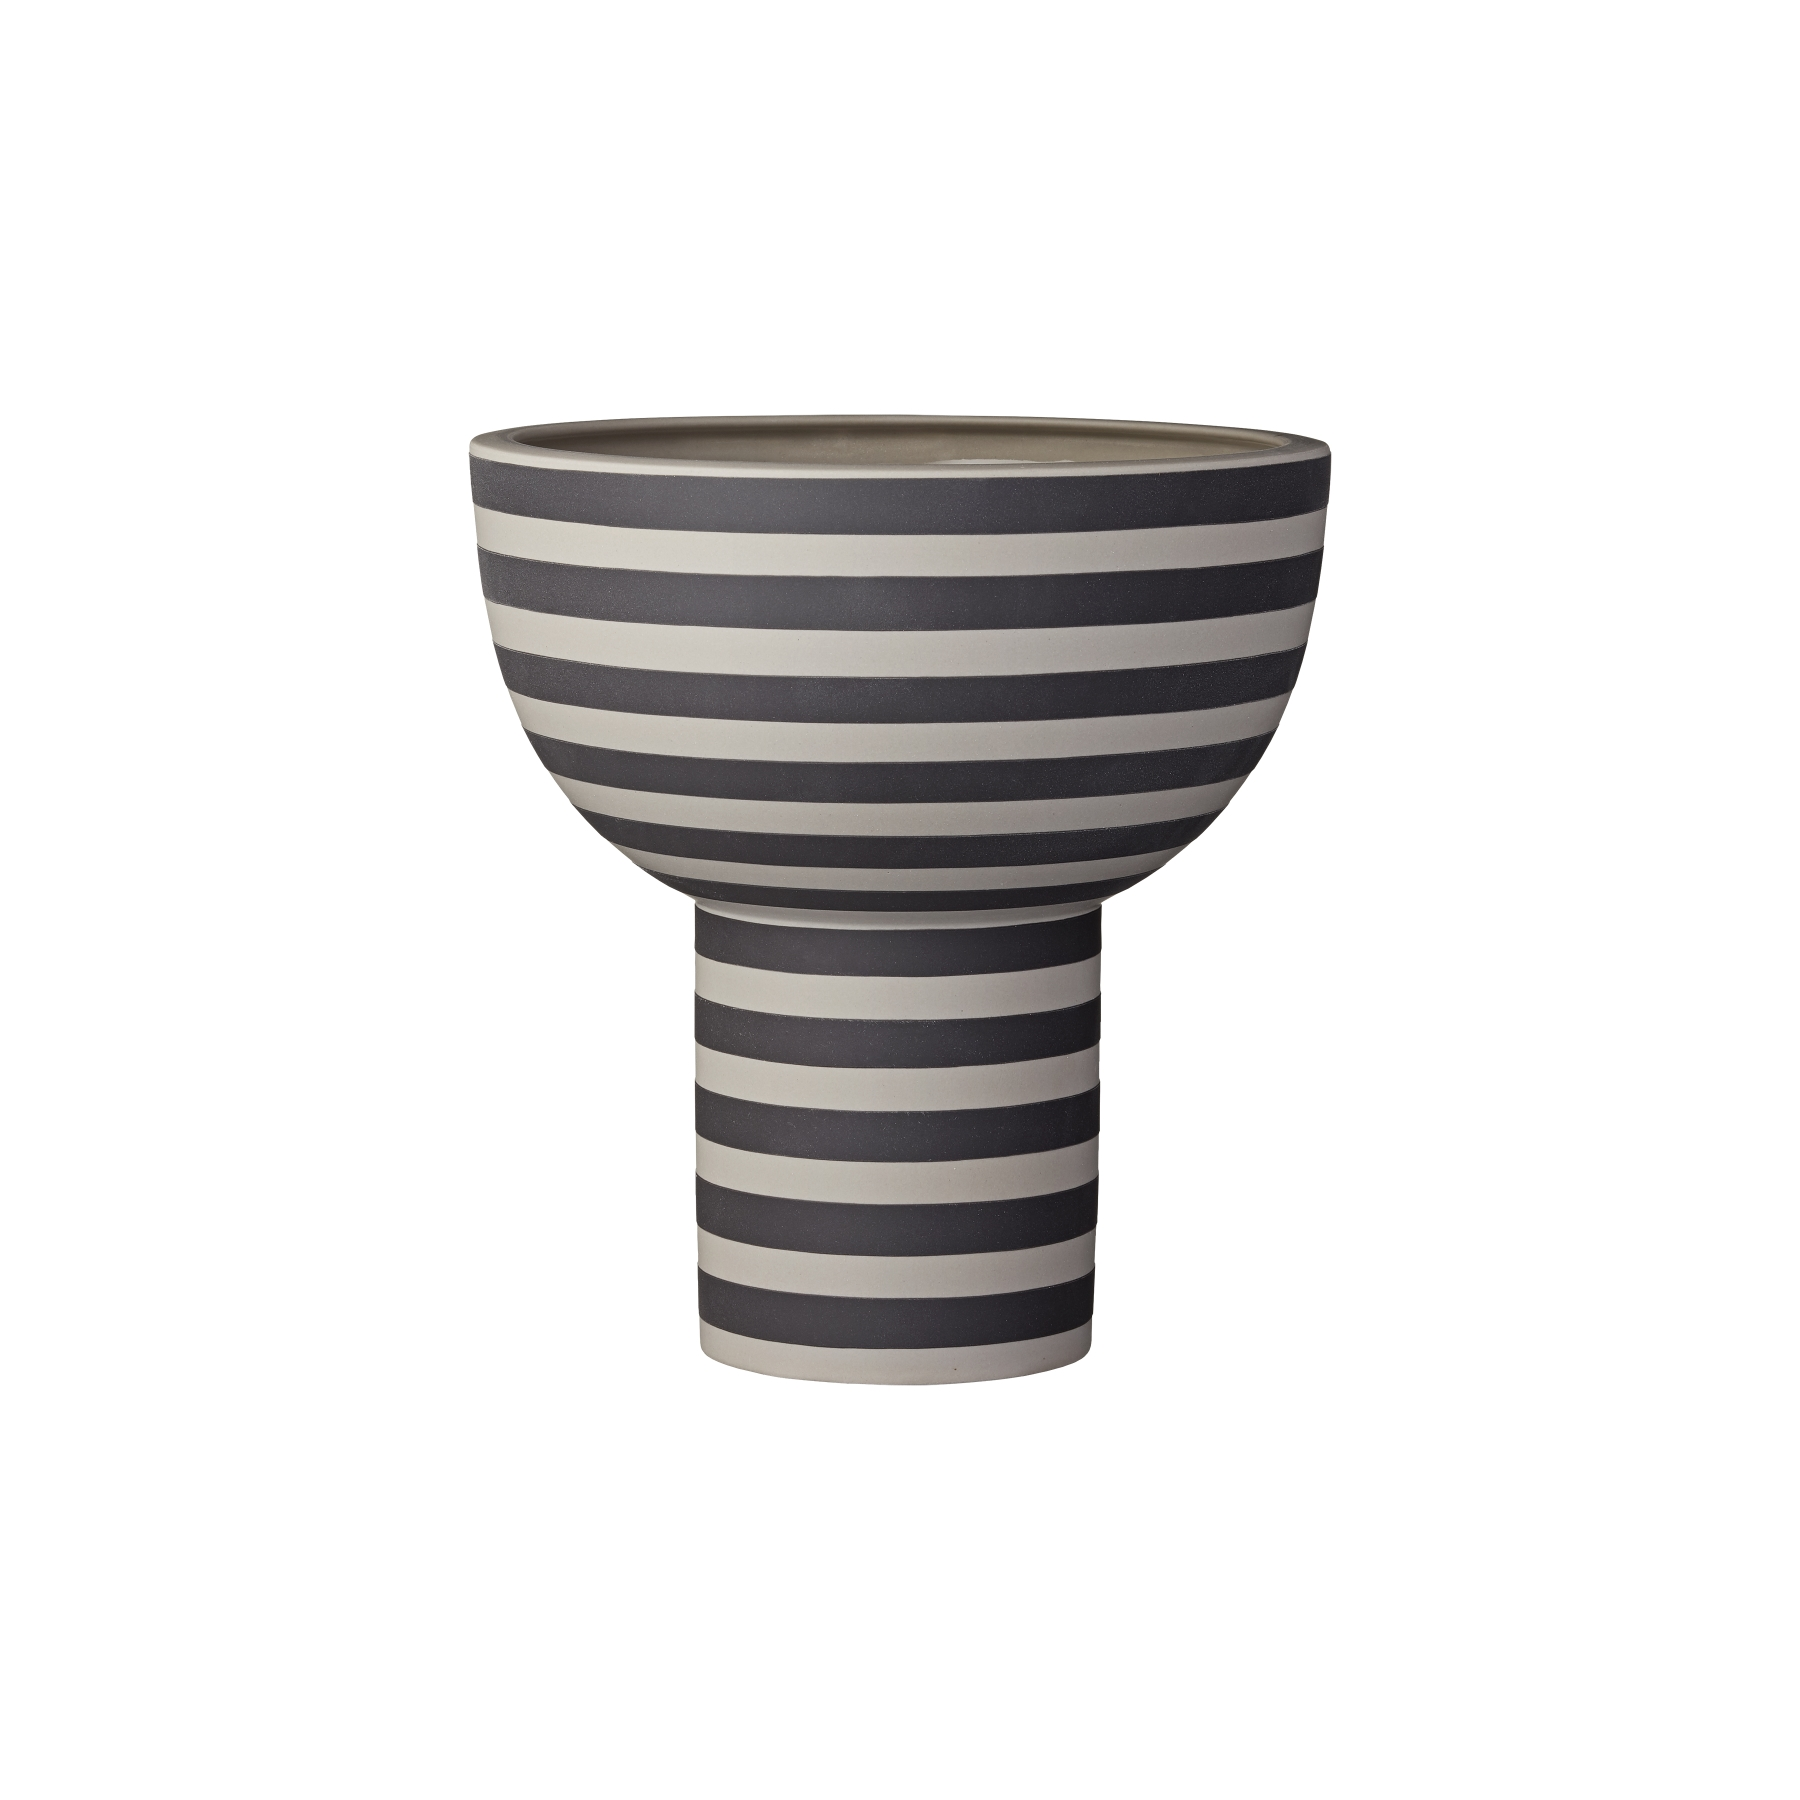 VARIA  vas sculptural ash/black, AYTM